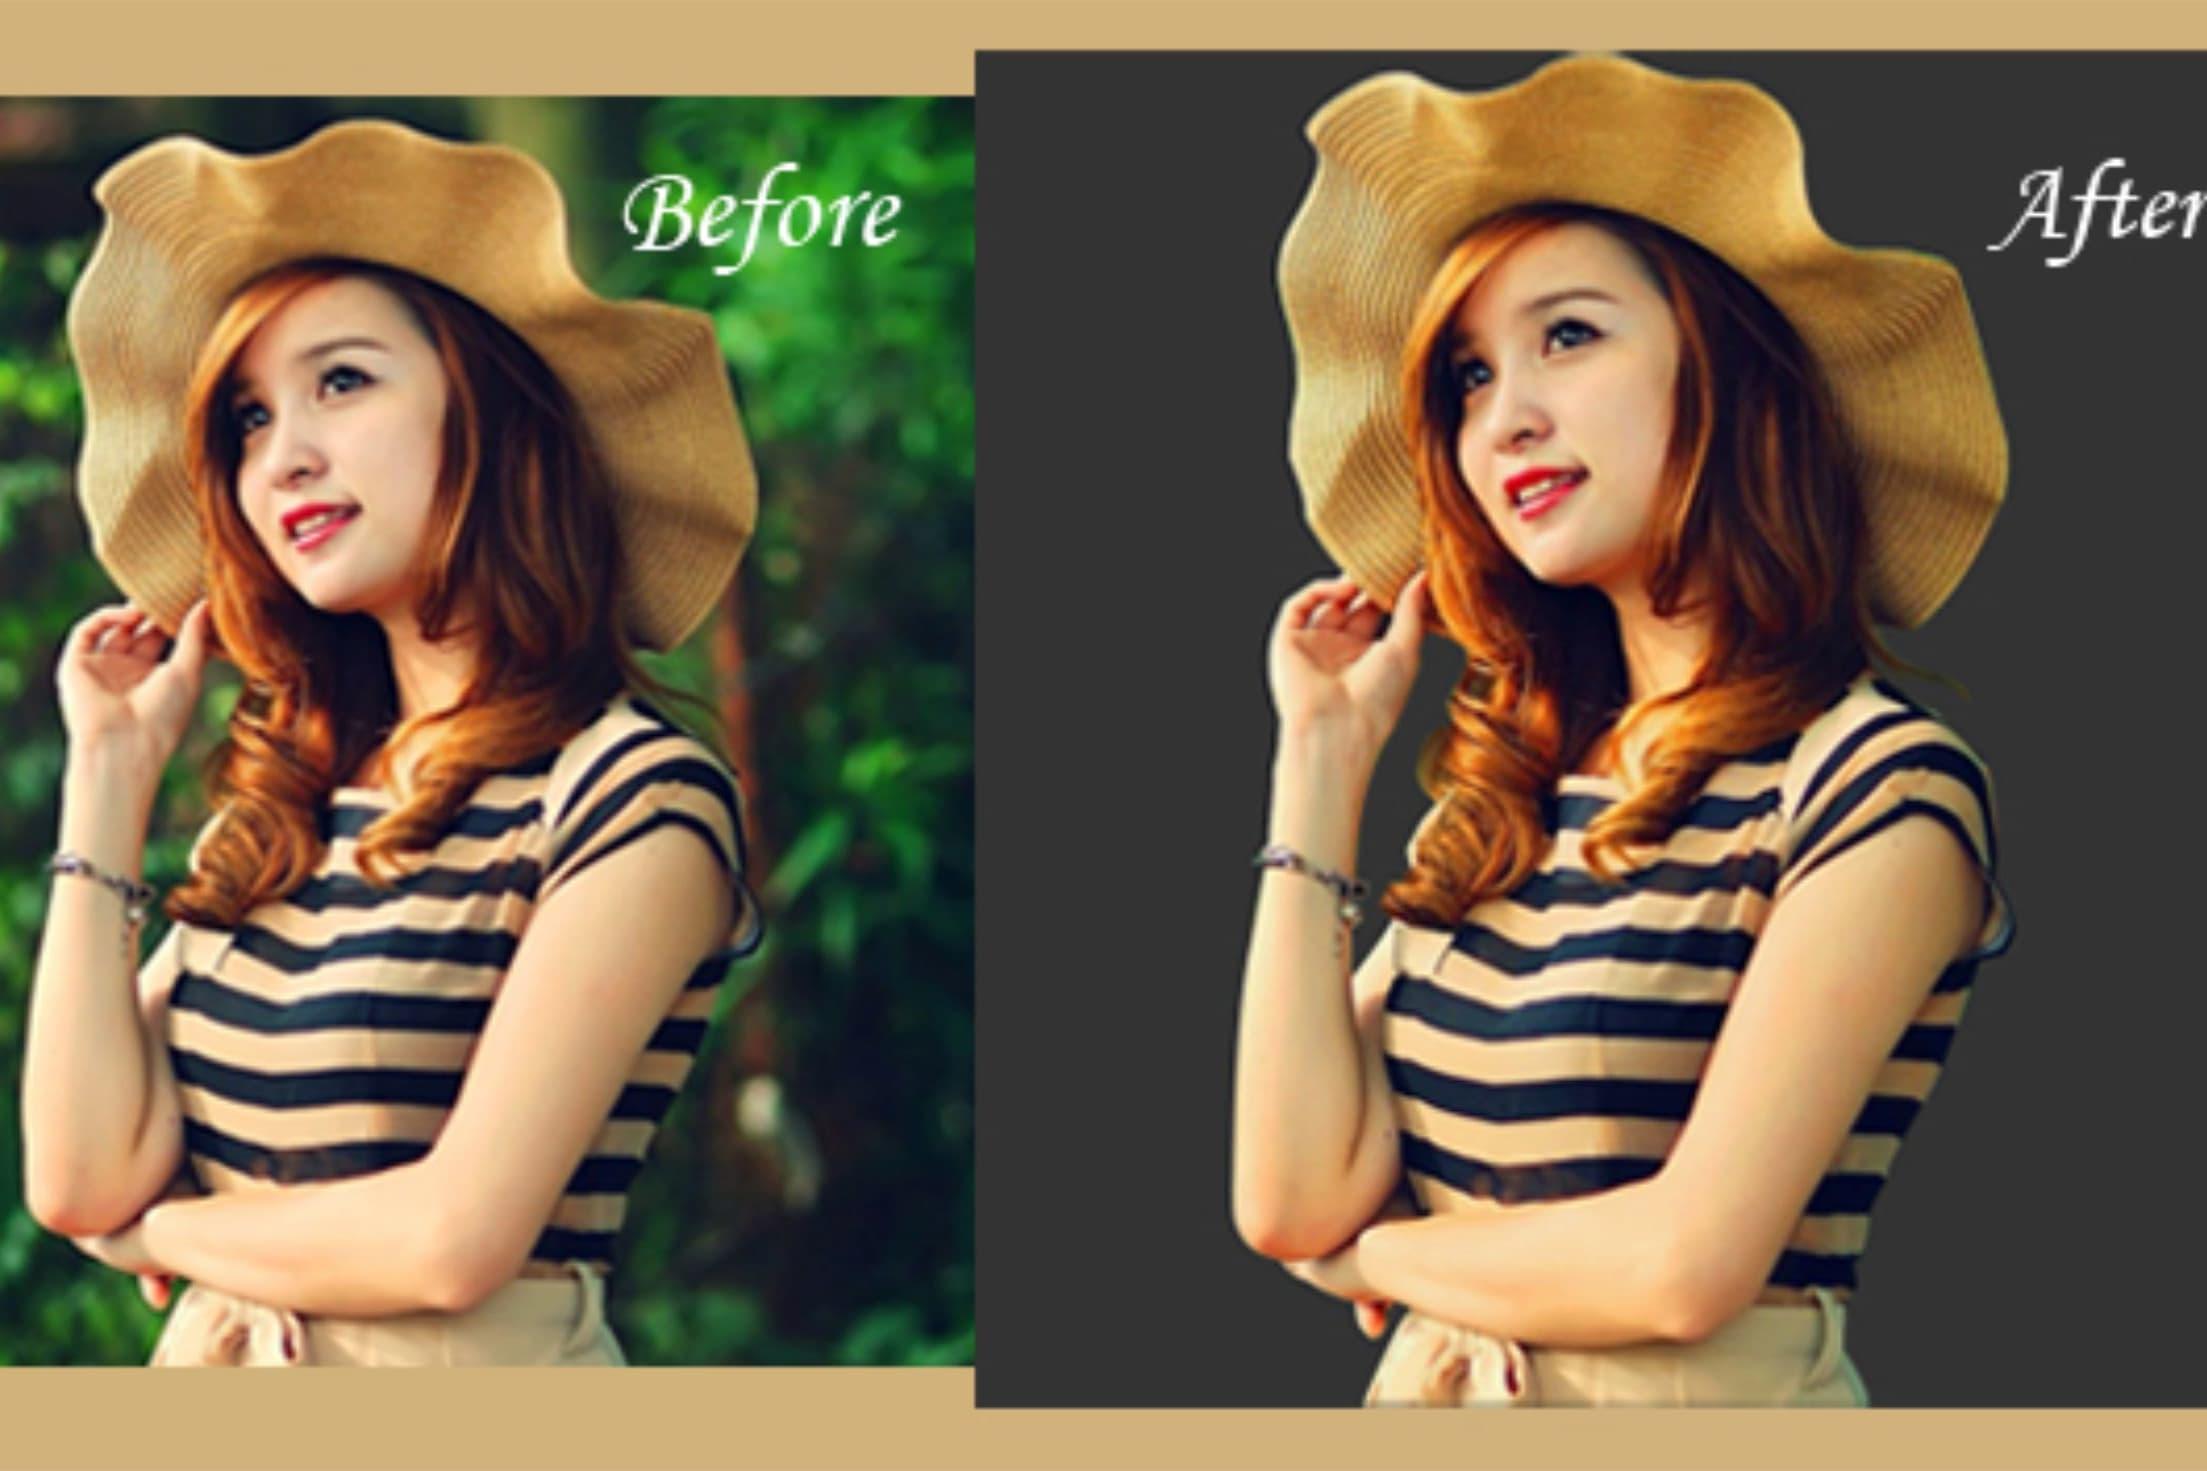 Portfolio for Photo Retouch, Enhance (Adobe Photoshop)